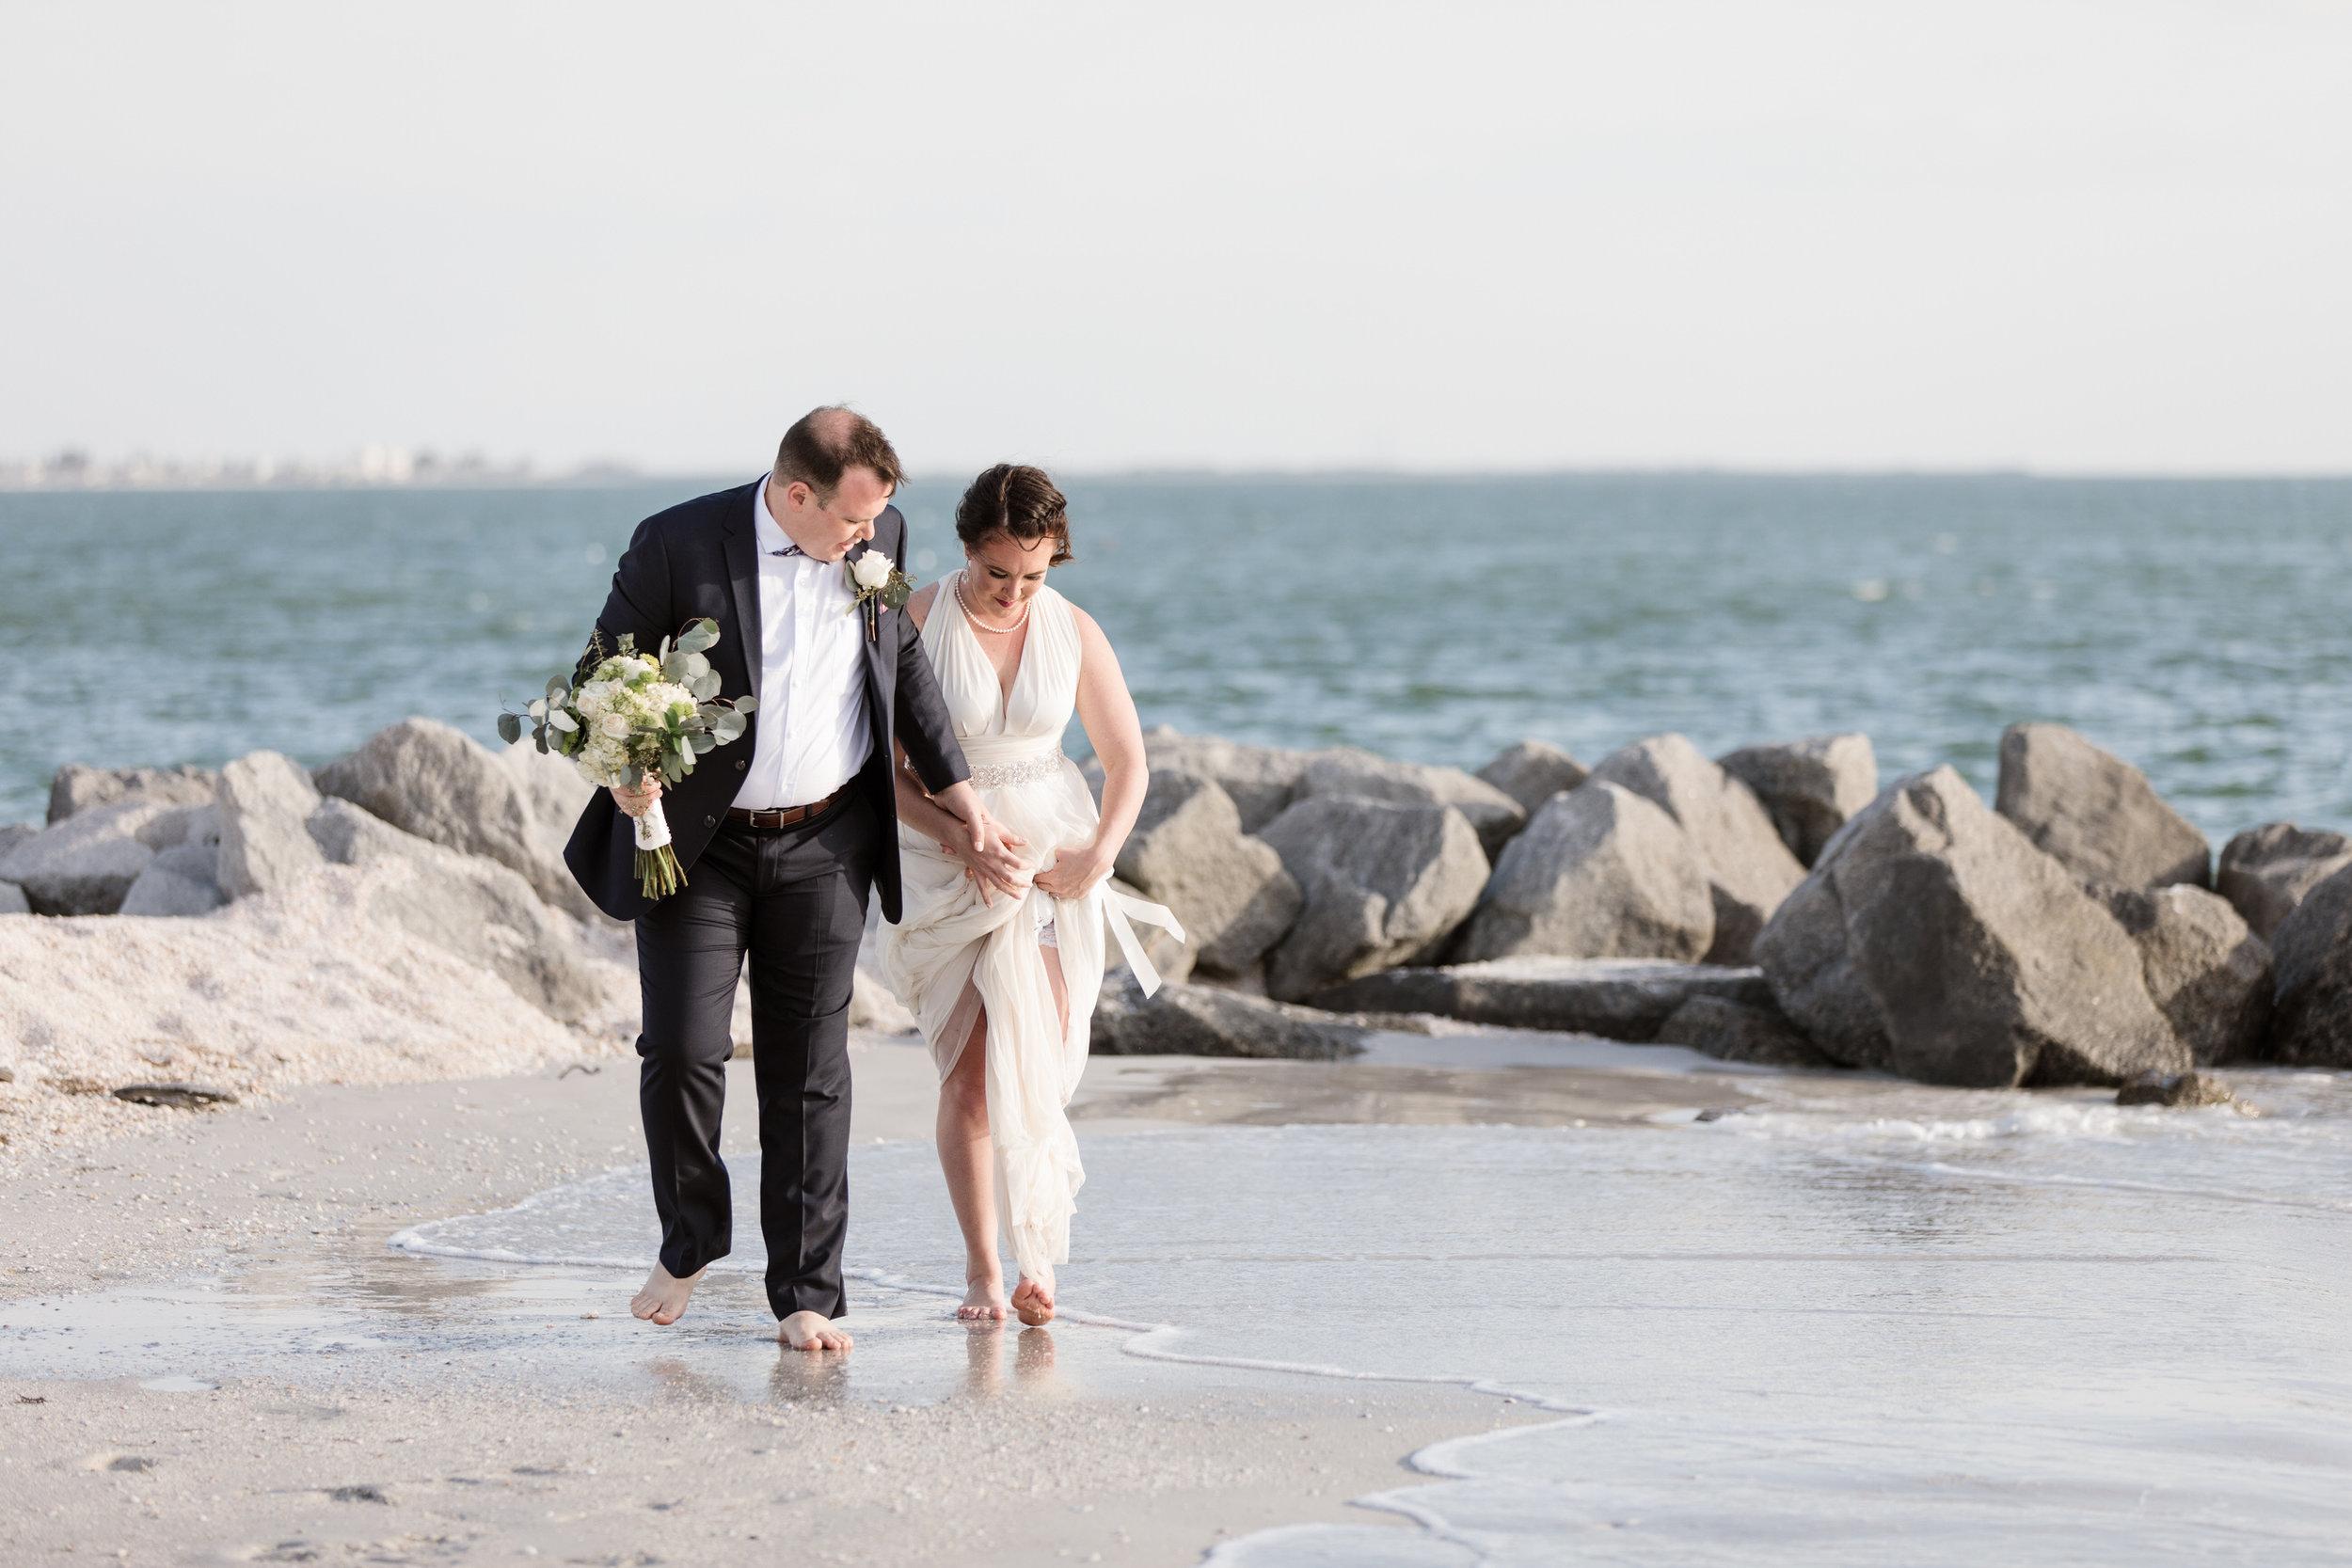 Beltran_Treasure_Island_Elopement_Tampa_Wedding_062-1.jpg